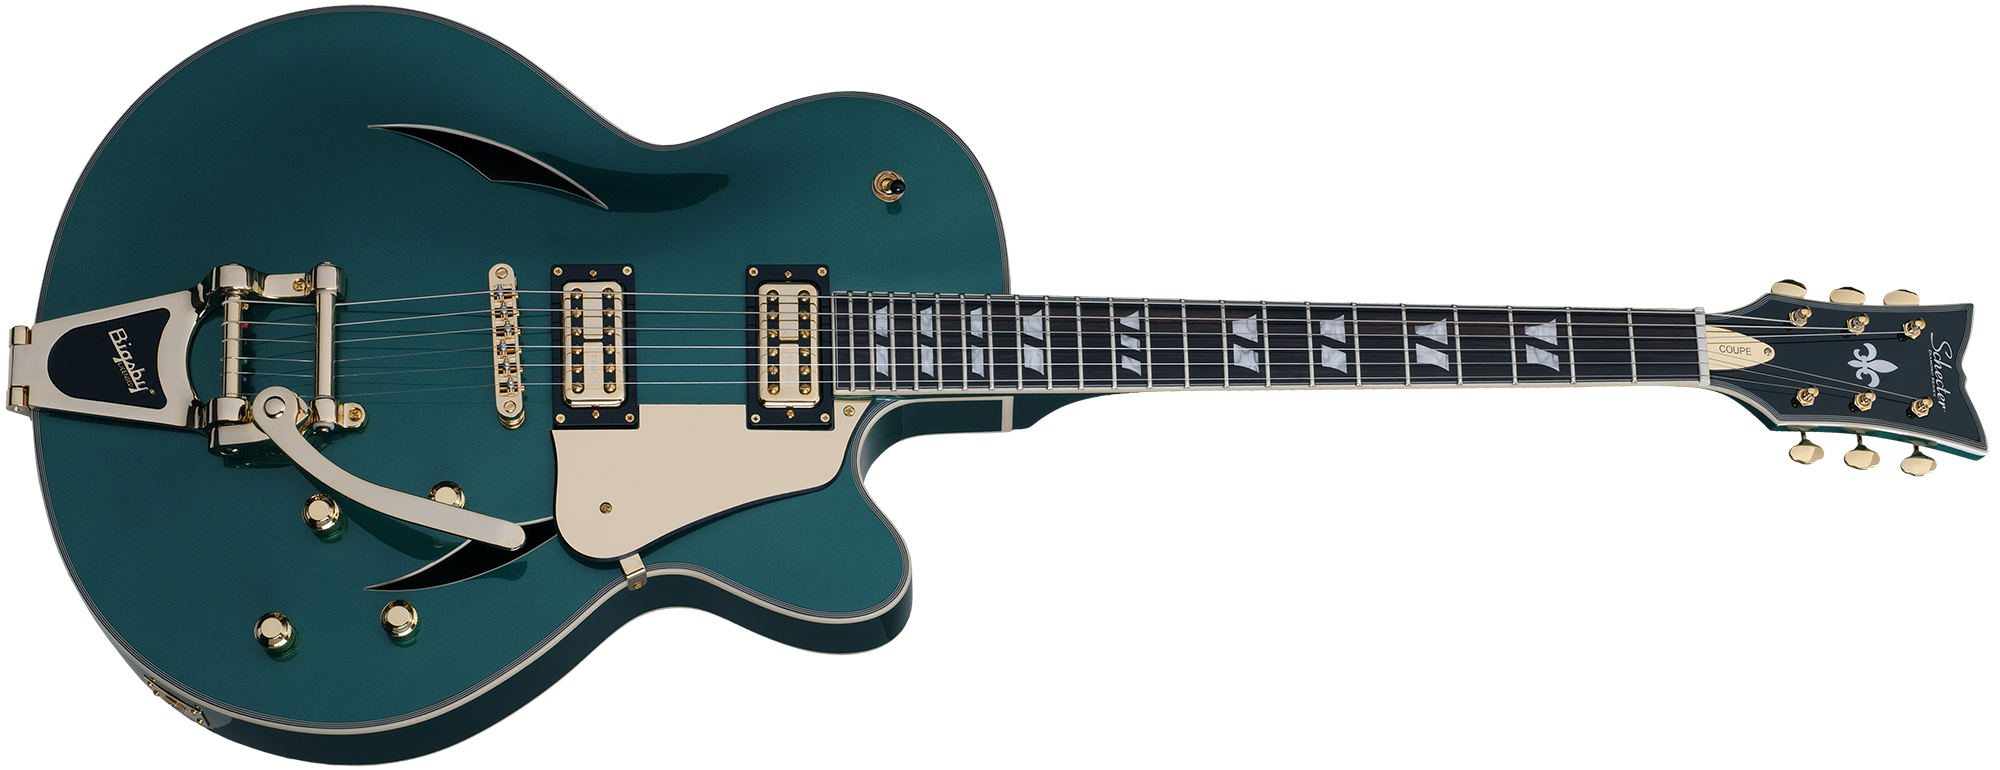 Coupe Dark Emerald Green (DEG) SKU #297